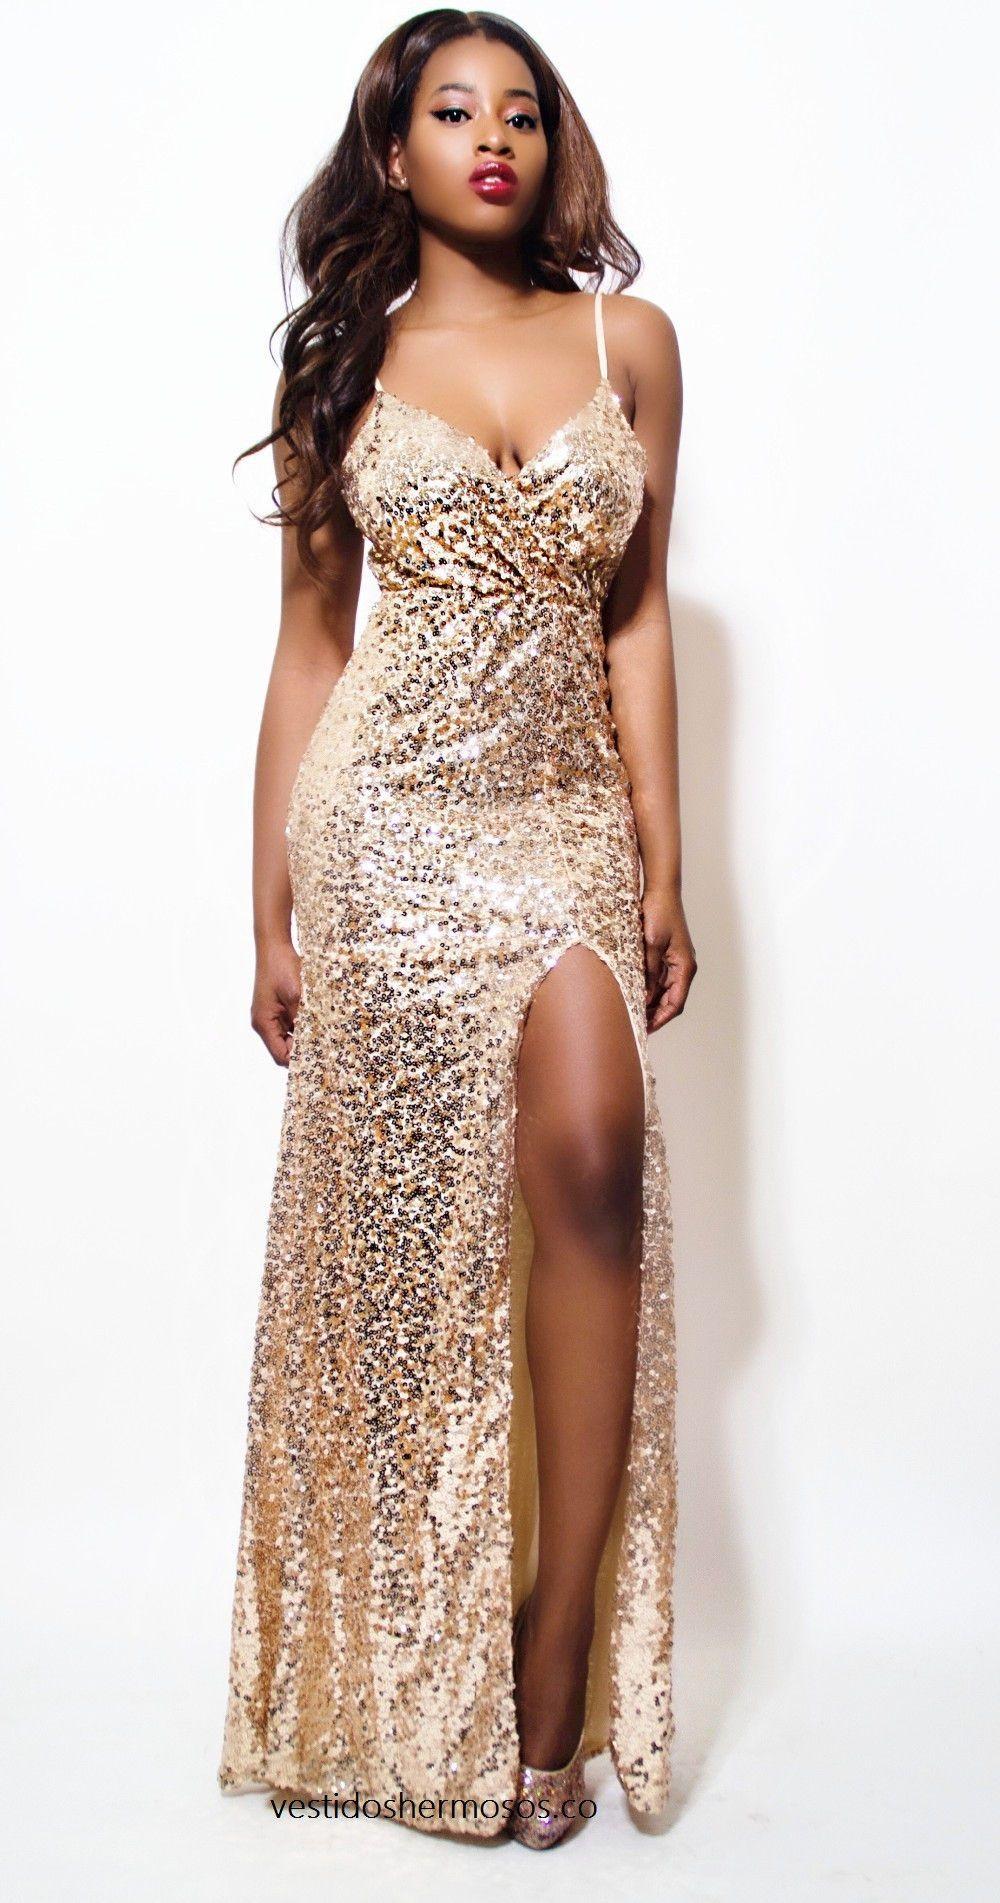 Luxury shining gold sequin maxi long dress elegant evening paillette